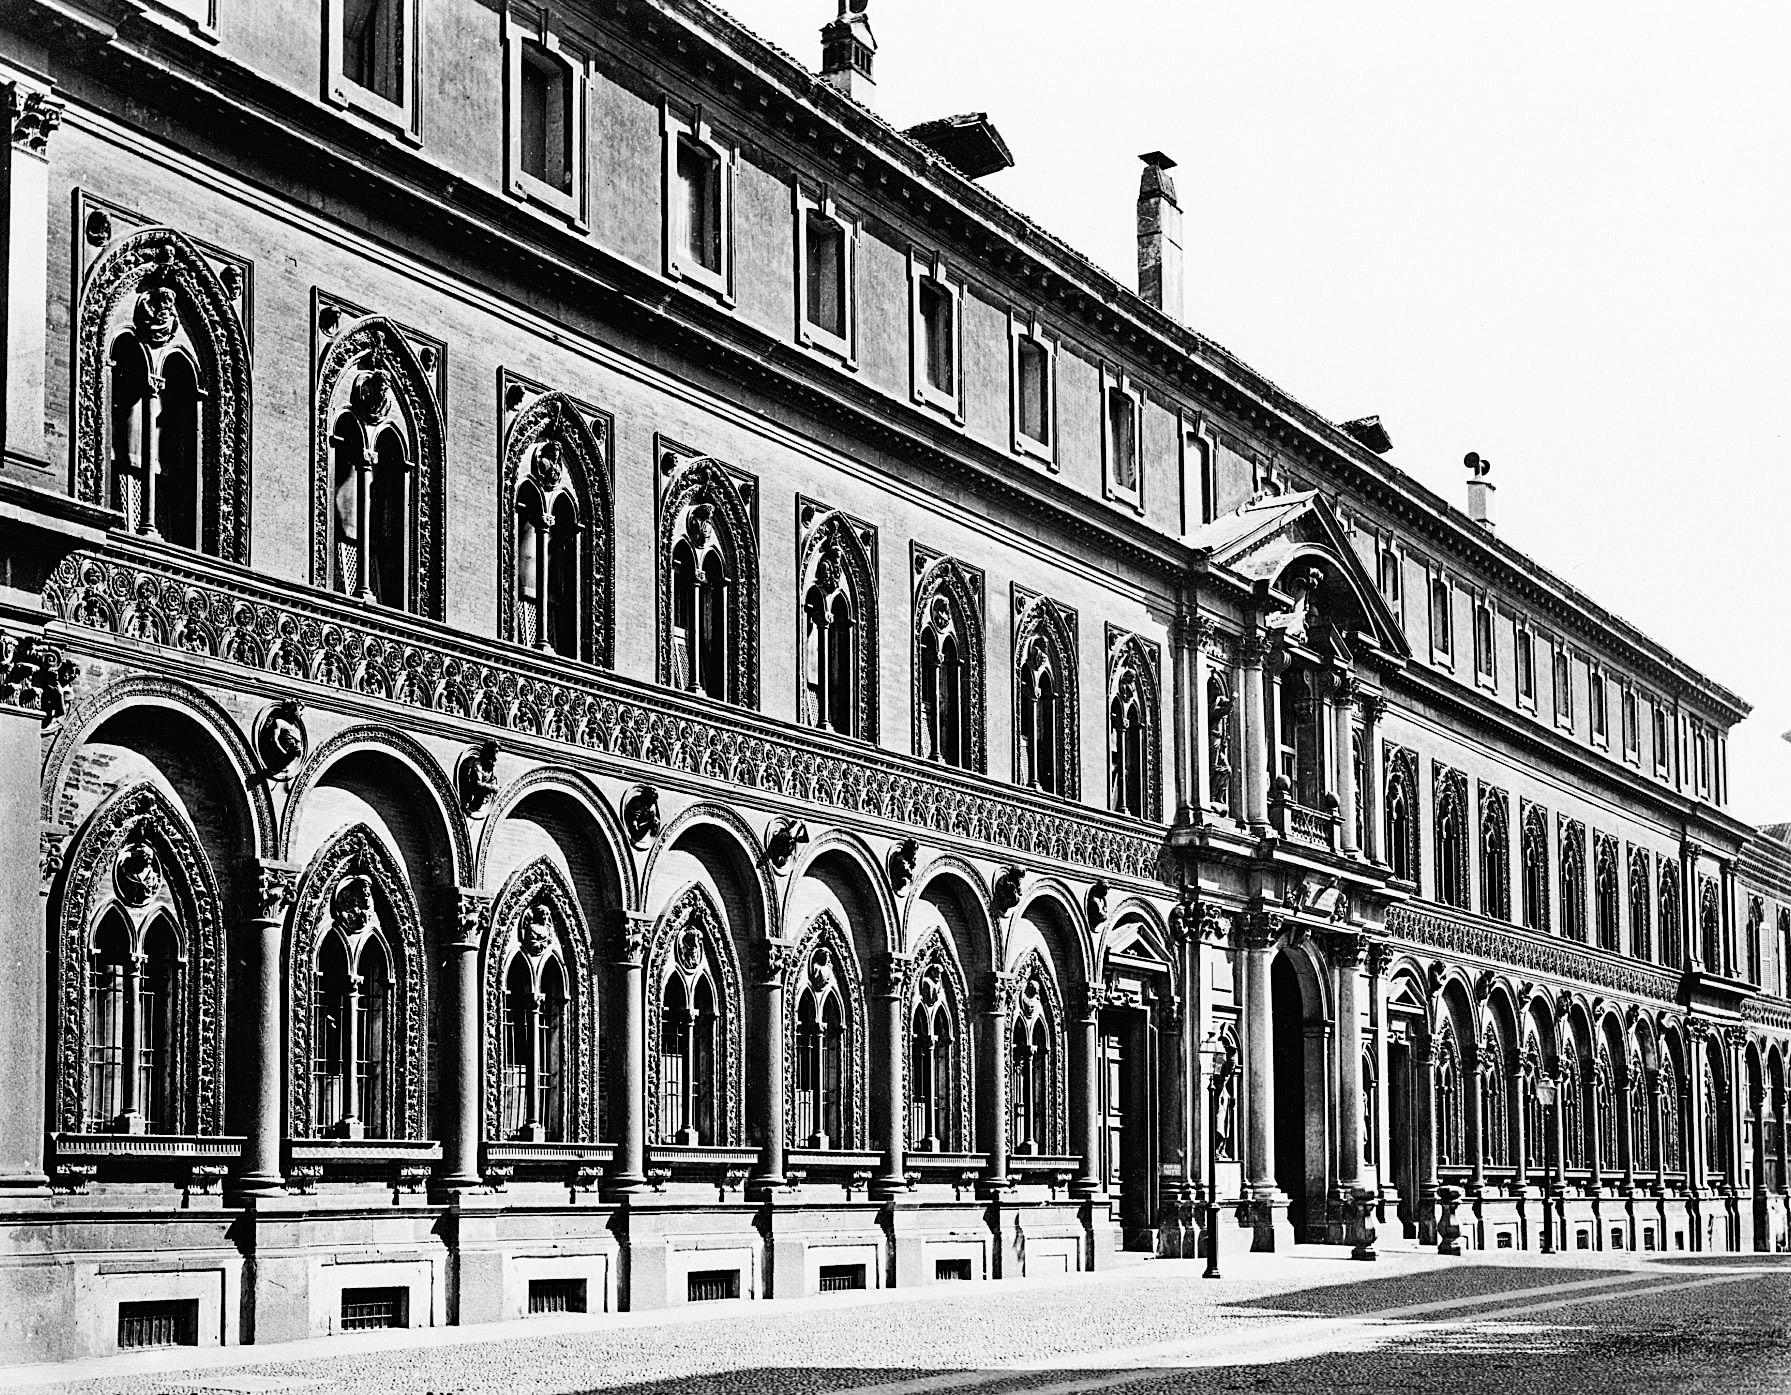 La Ca' Granda, Milano